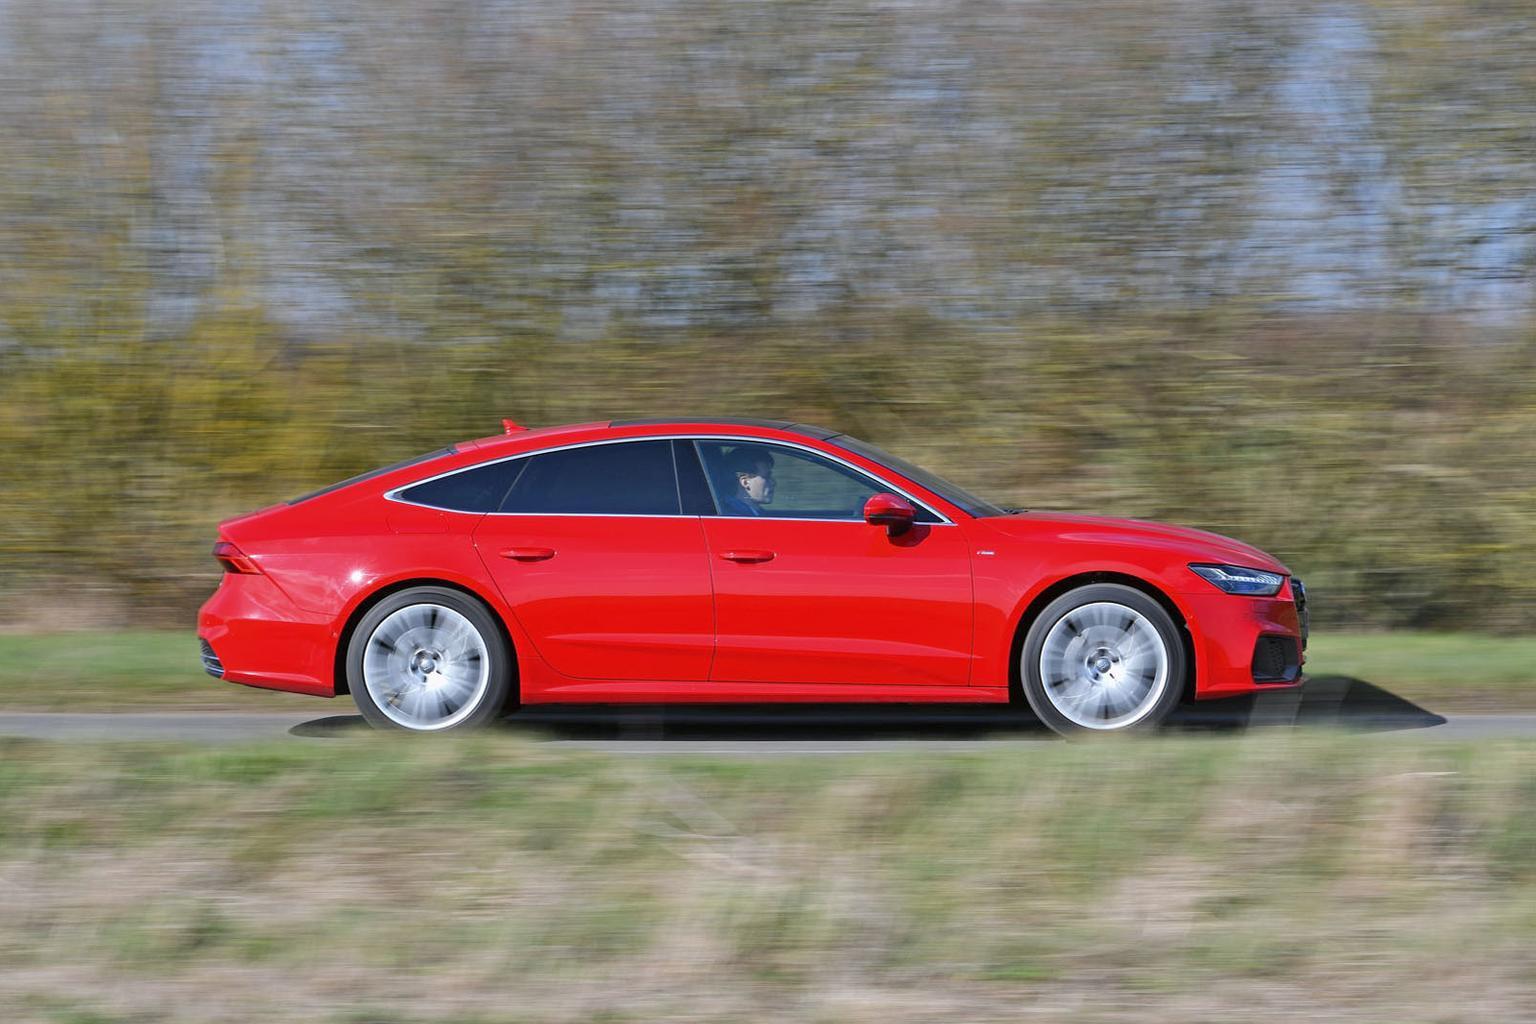 Audi A7 Sportback Vs Bmw 6 Series Gt Vs Mercedes Cls What Car